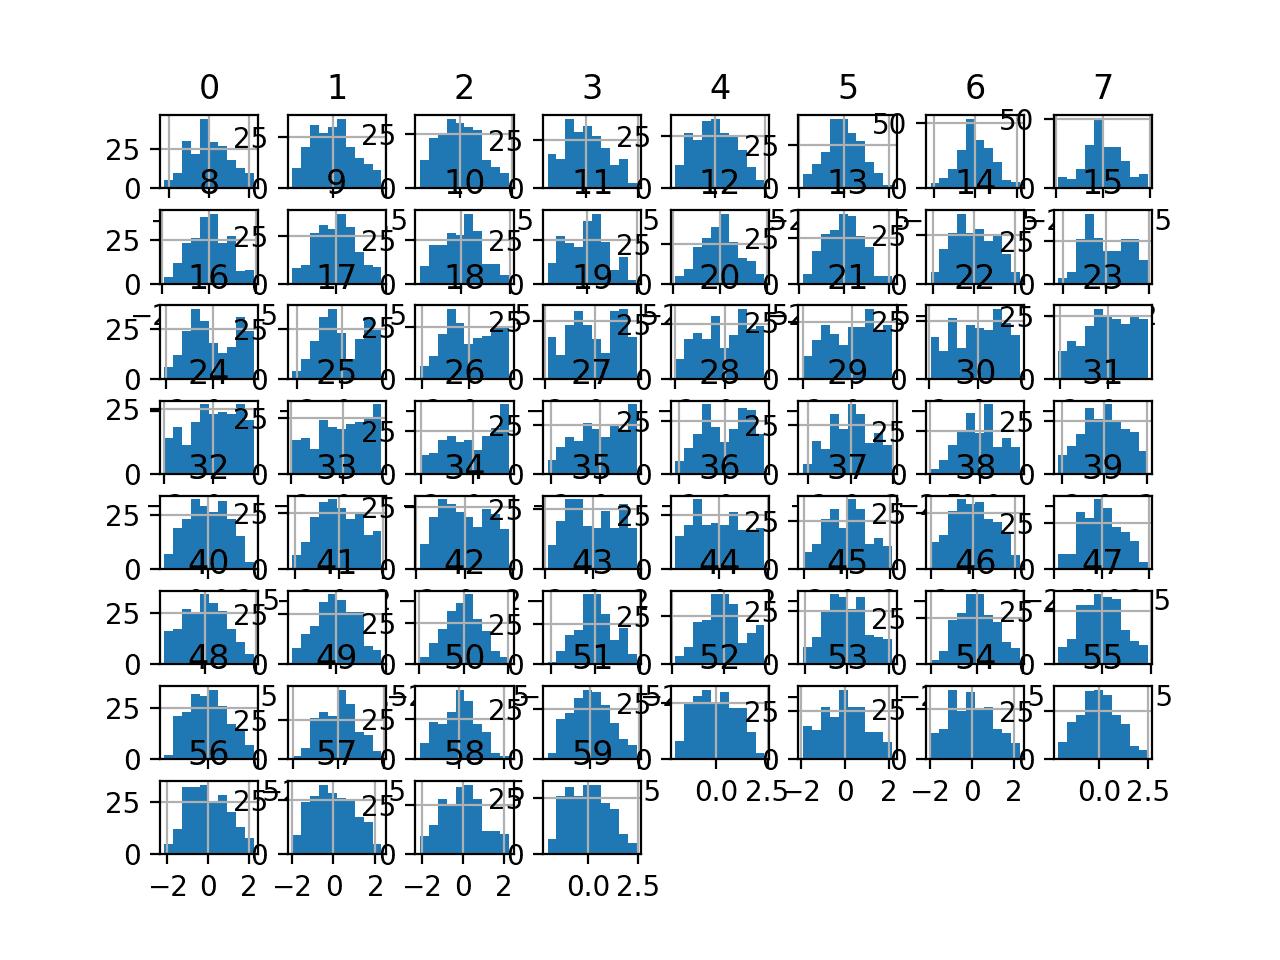 Histogram Plots of Yeo-Johnson Transformed Input Variables for the Sonar Dataset